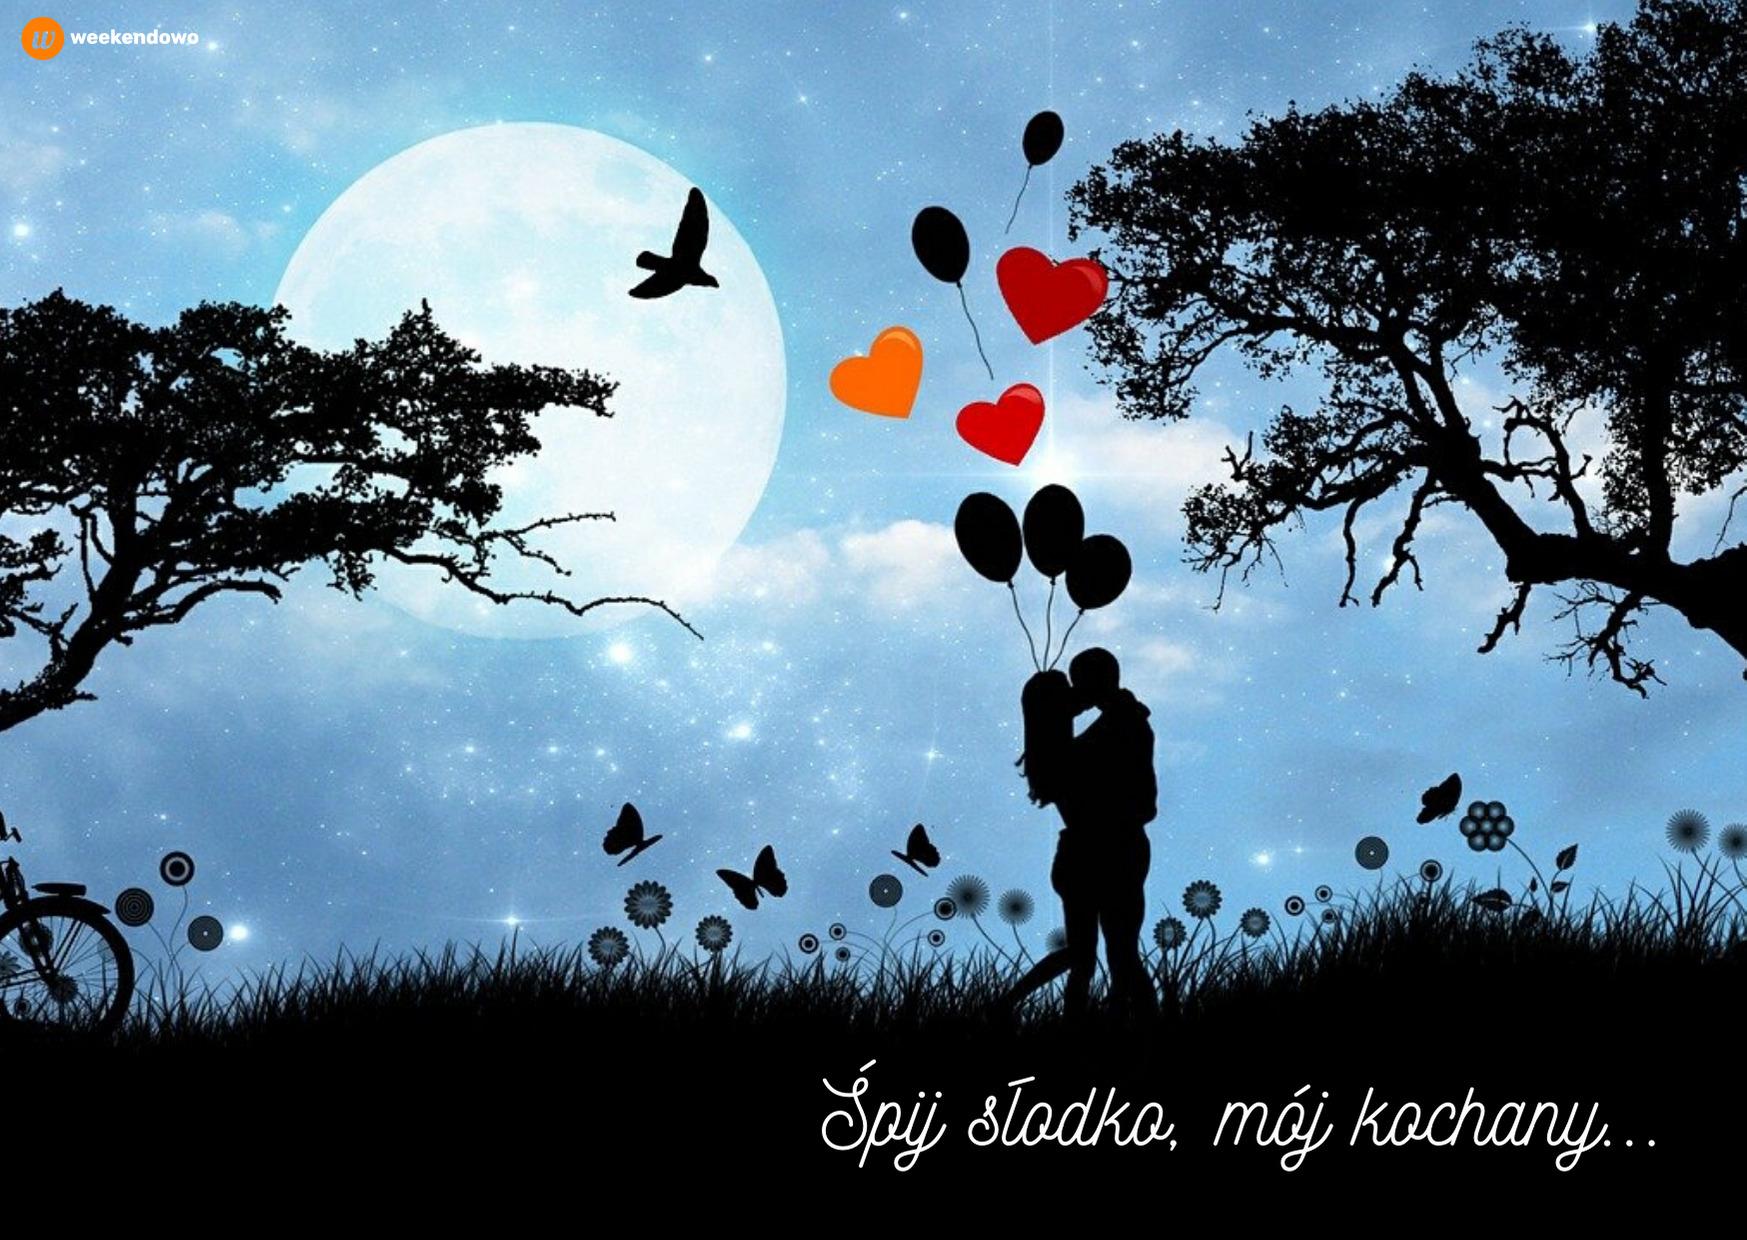 Miłosna kartka na dobranoc